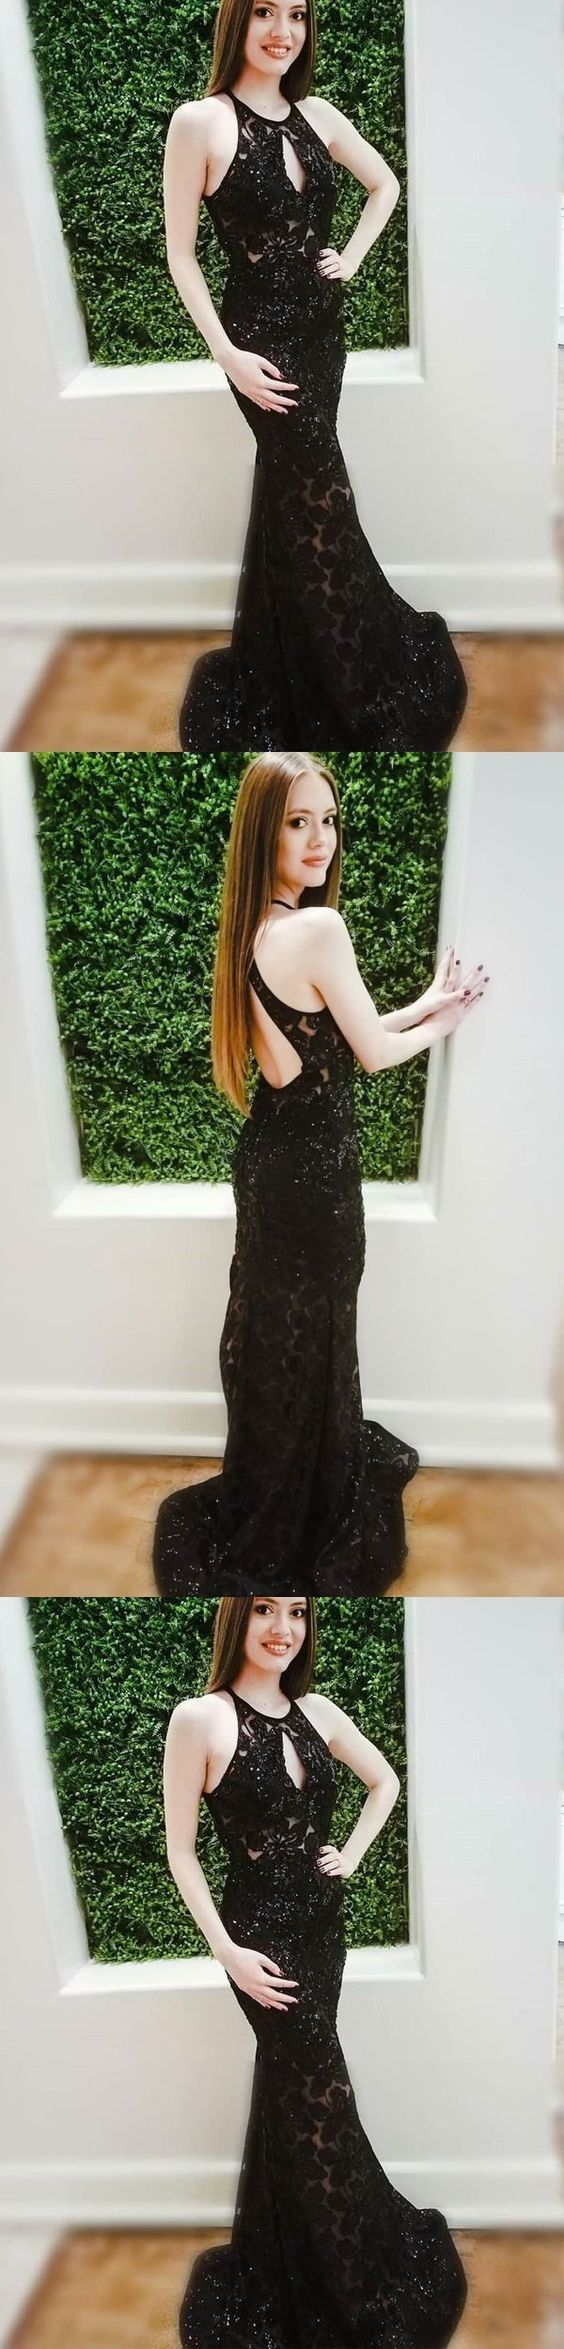 Halter Black Lace Mermaid Custom Long Evening Prom Dresses